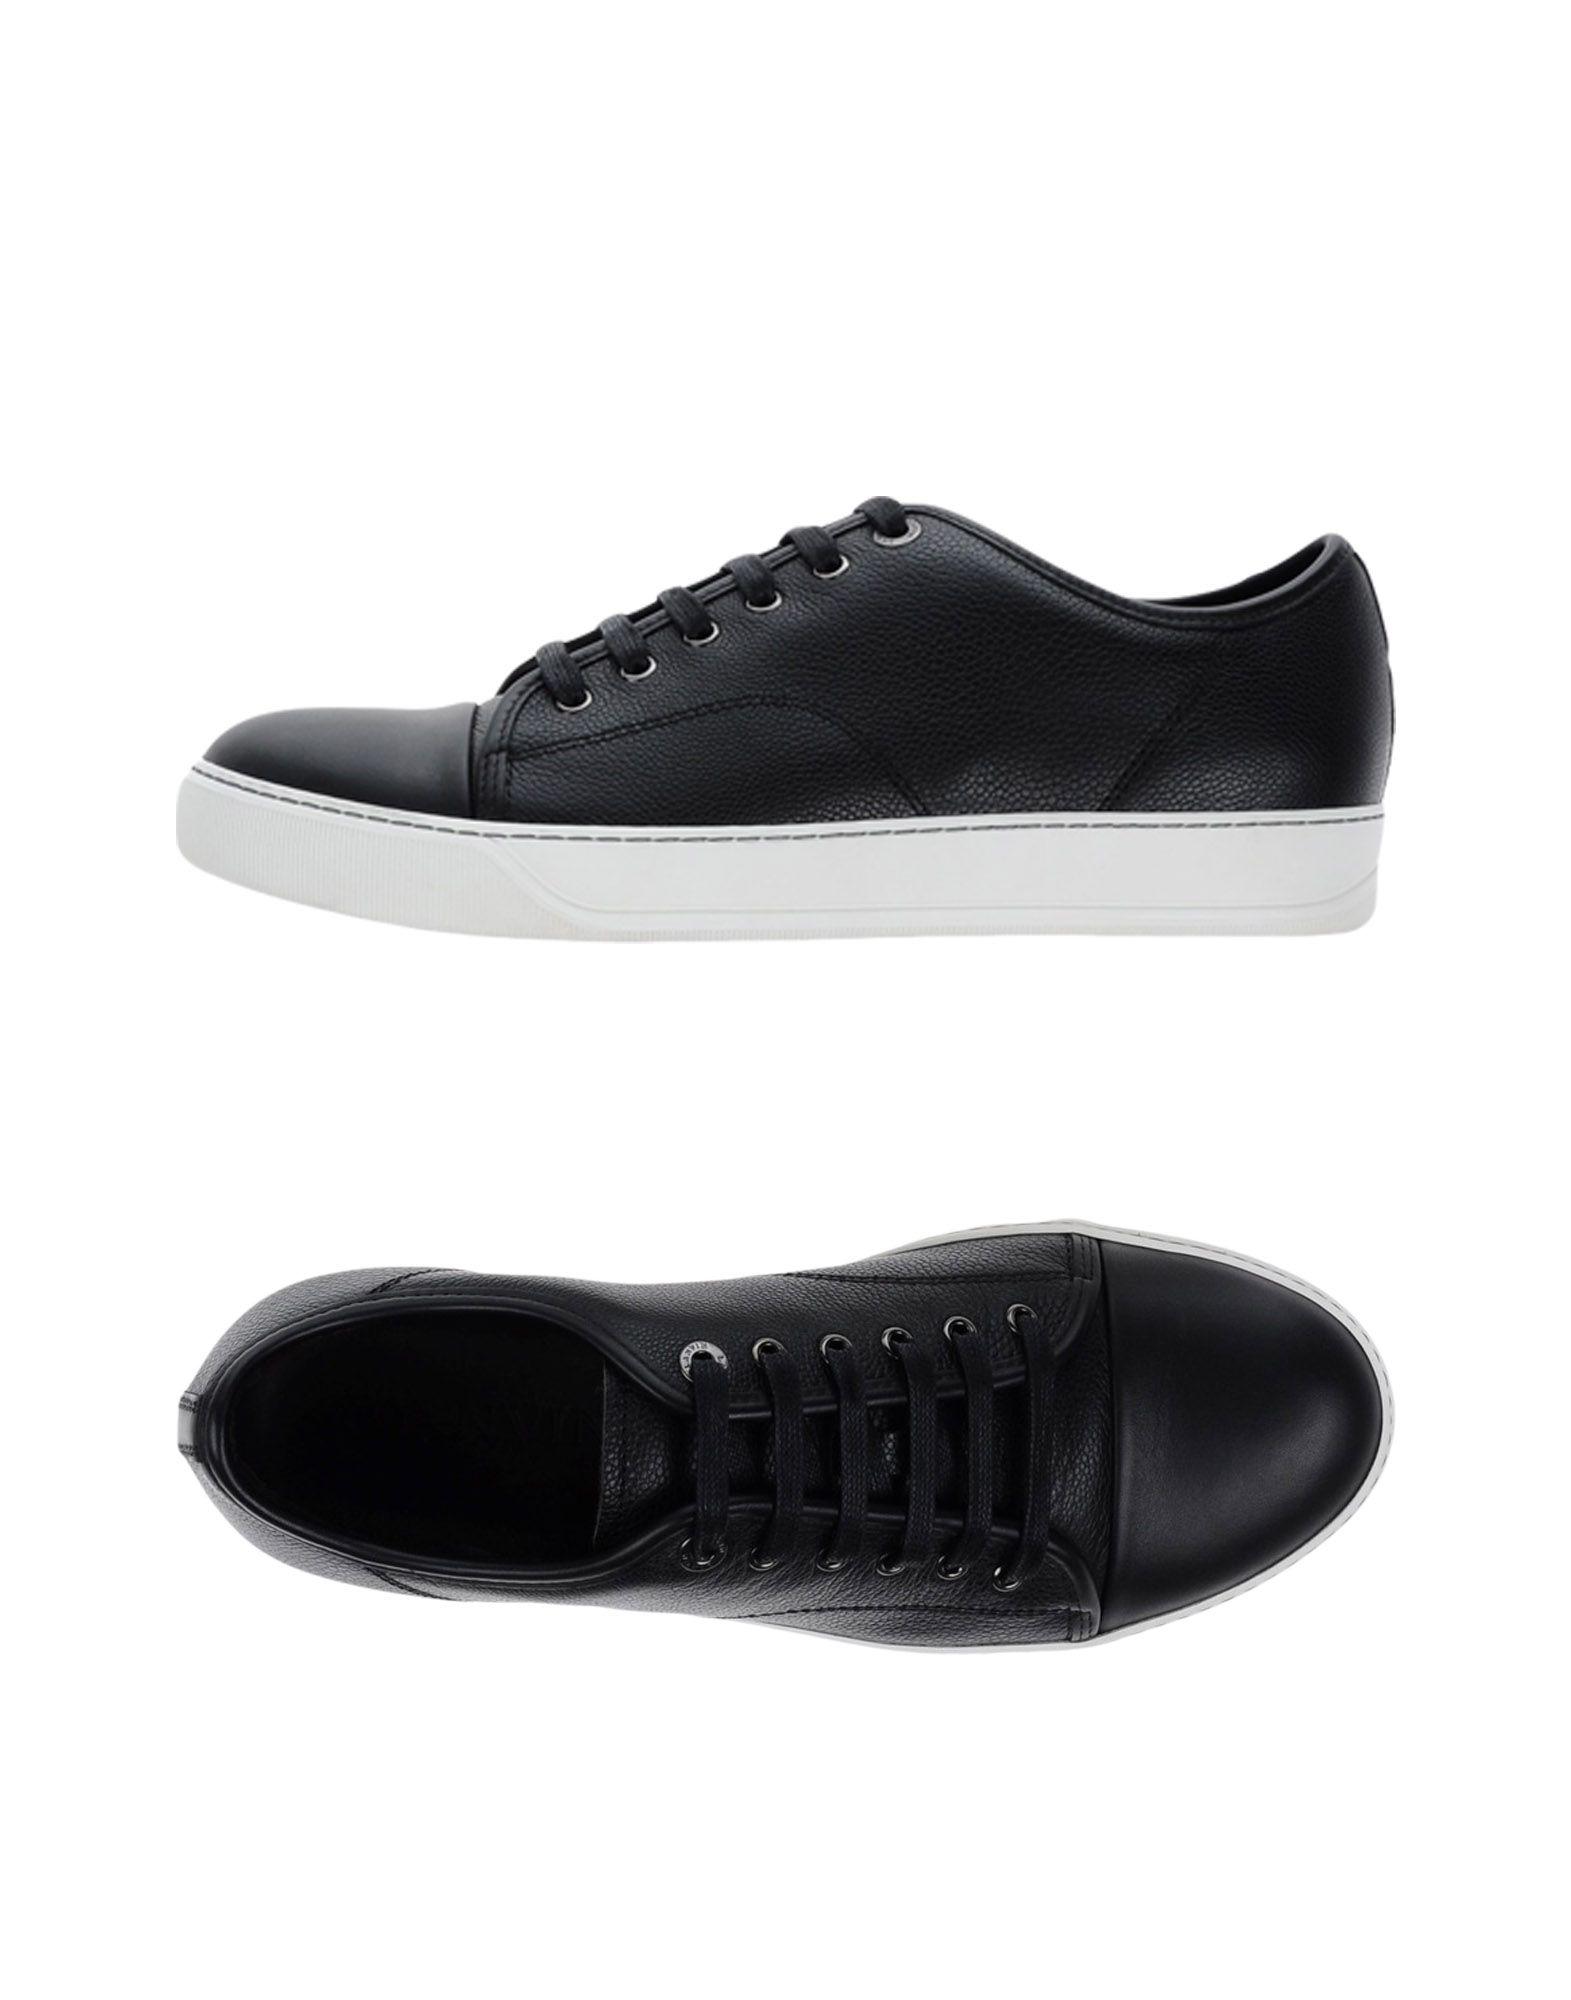 Moda Sneakers Lanvin Uomo Uomo Lanvin - 11264940JQ 50cdec